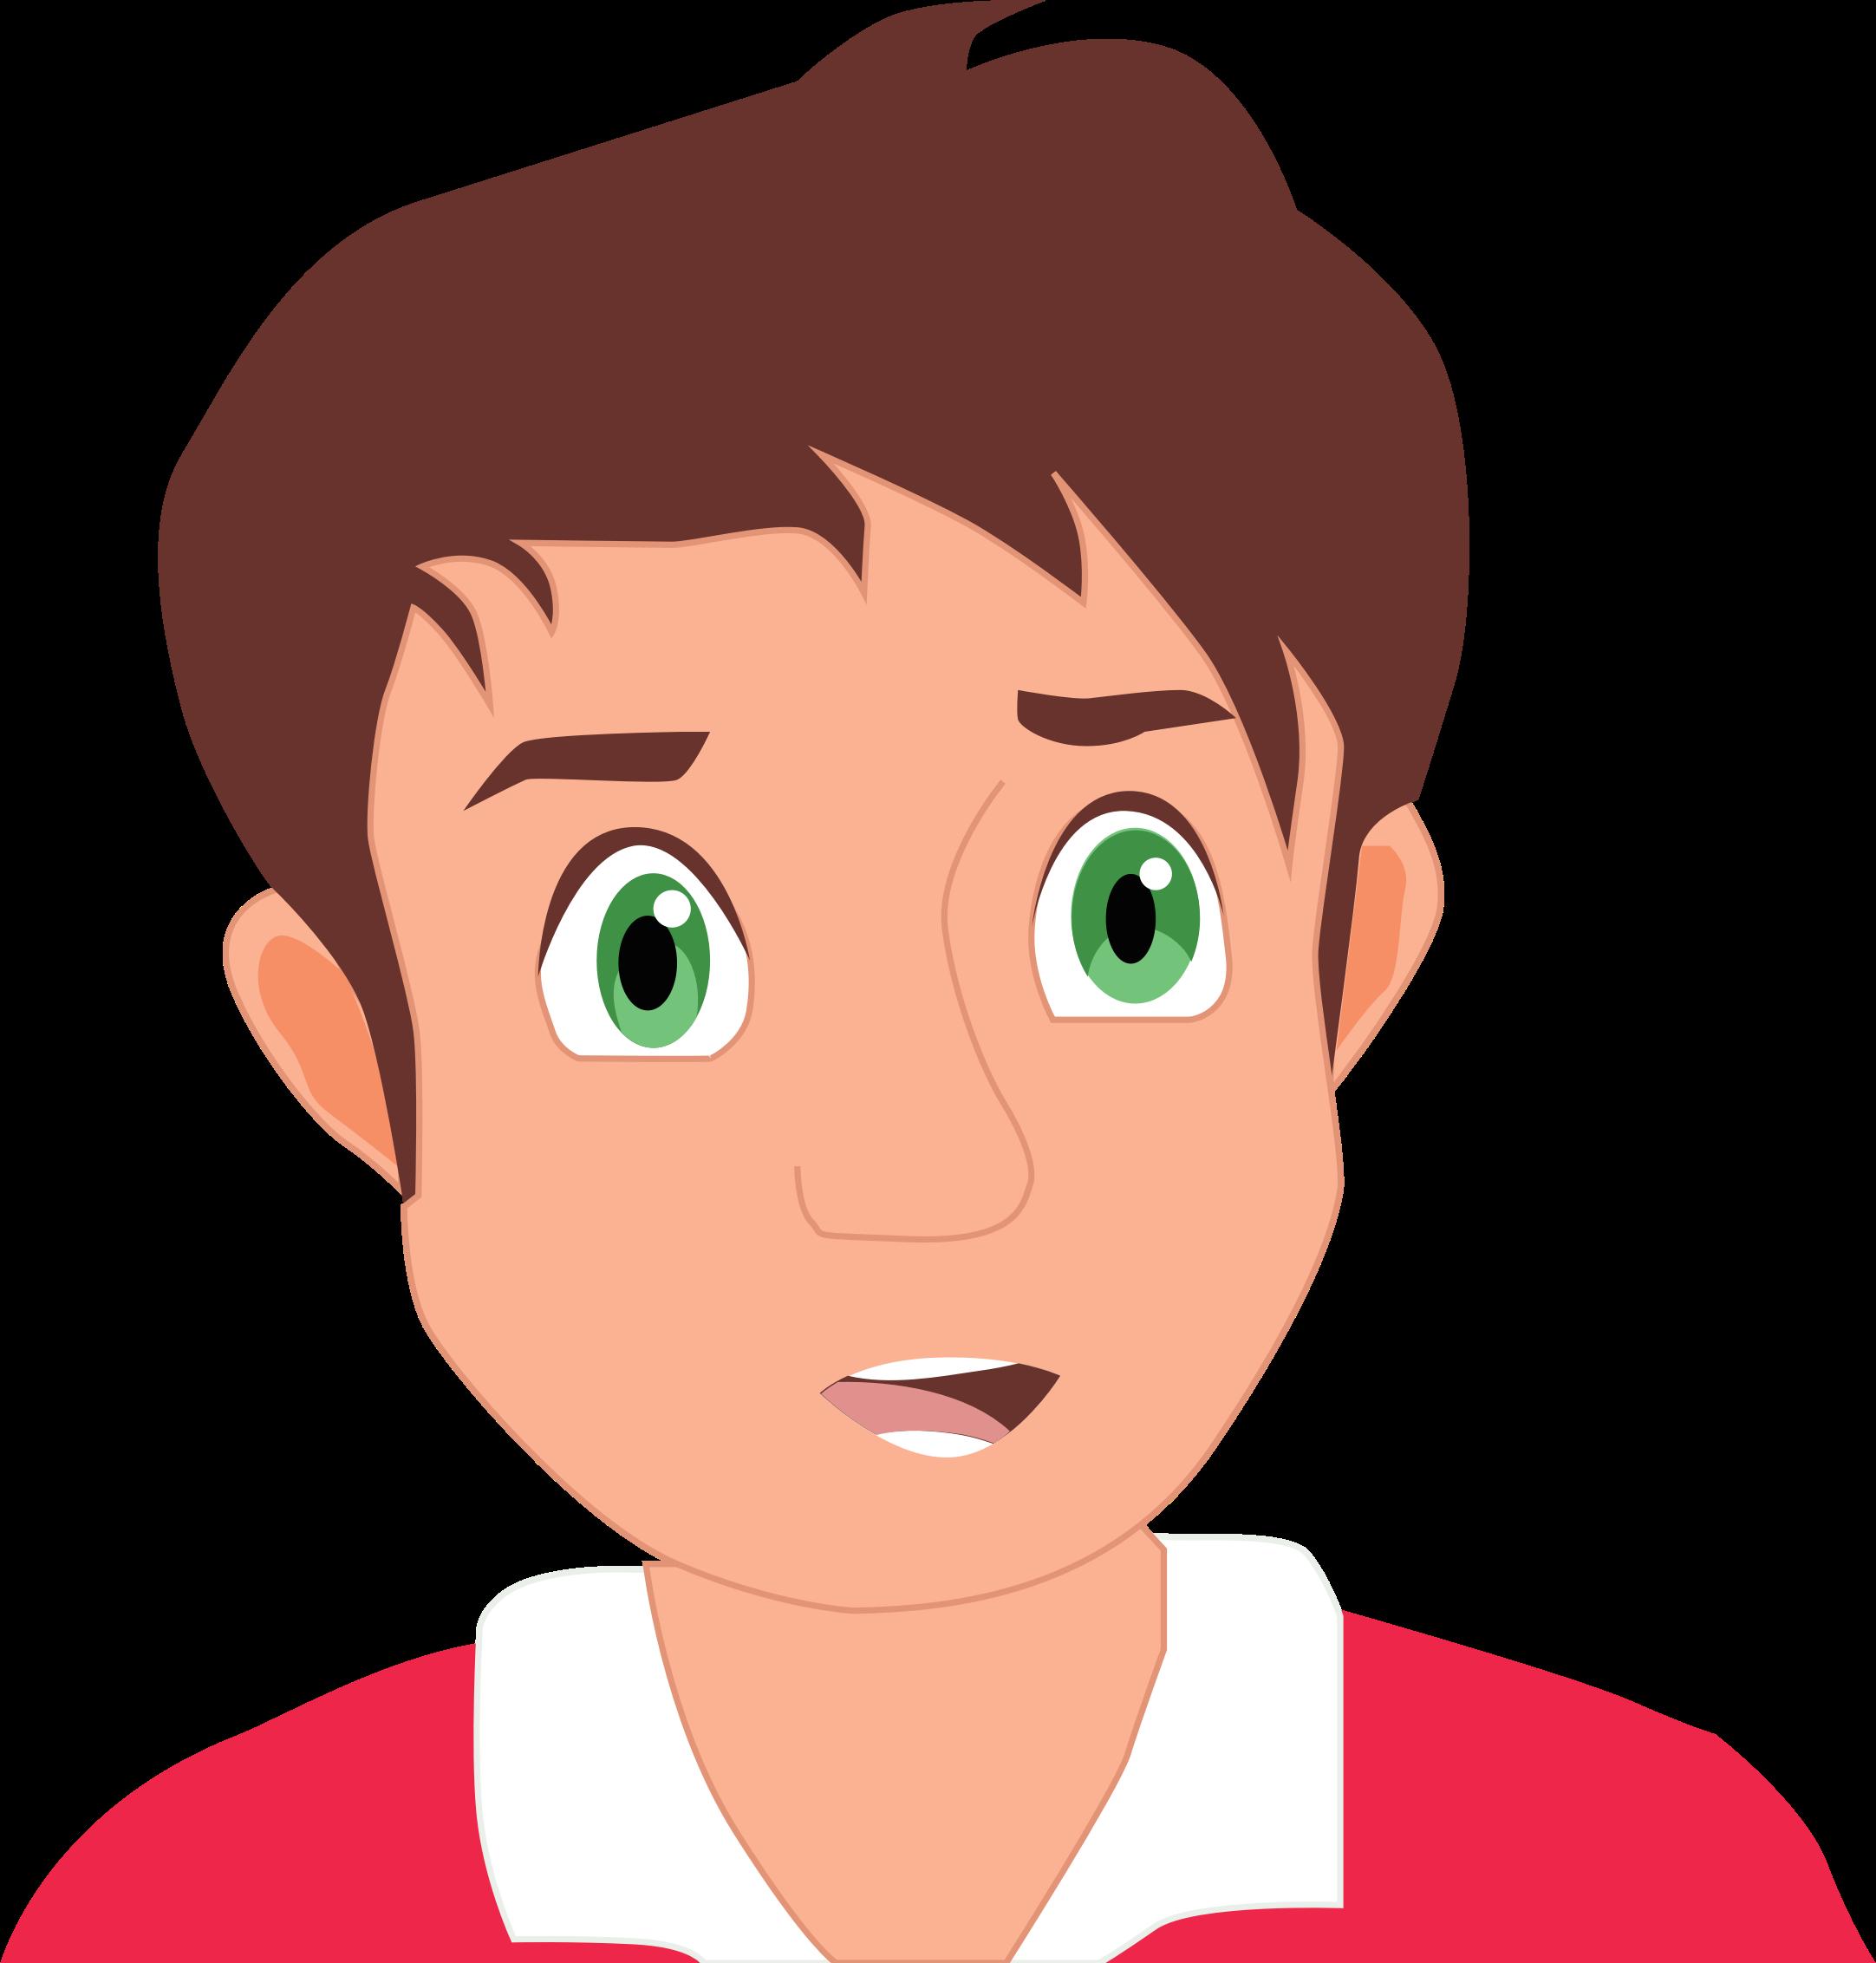 Clipart Cartoon Boy